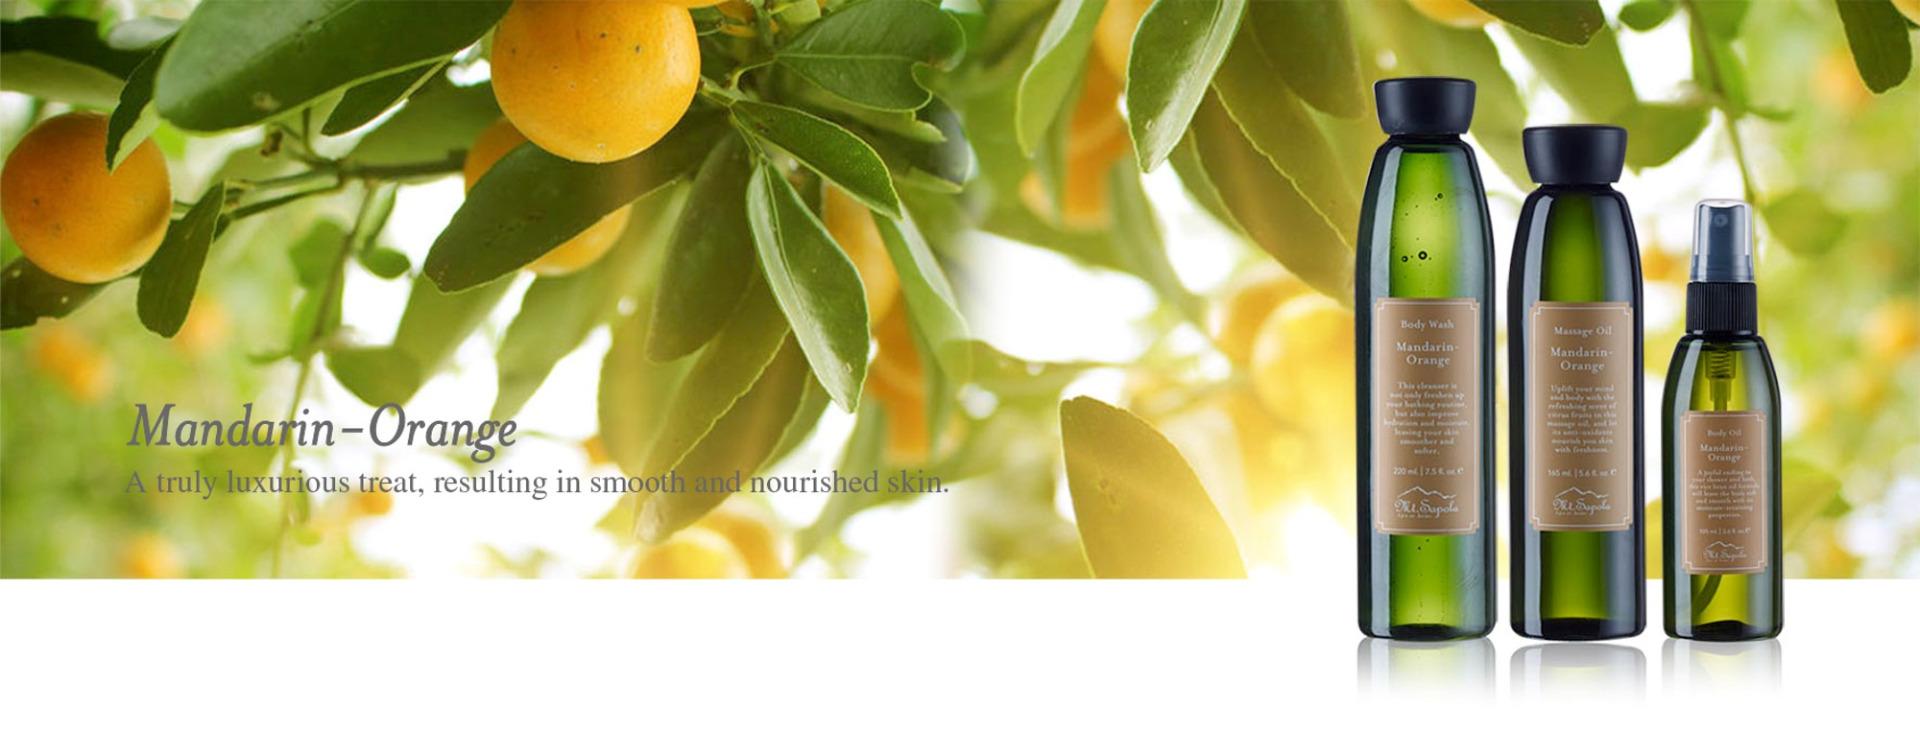 Body Spa Mandarin-Orange